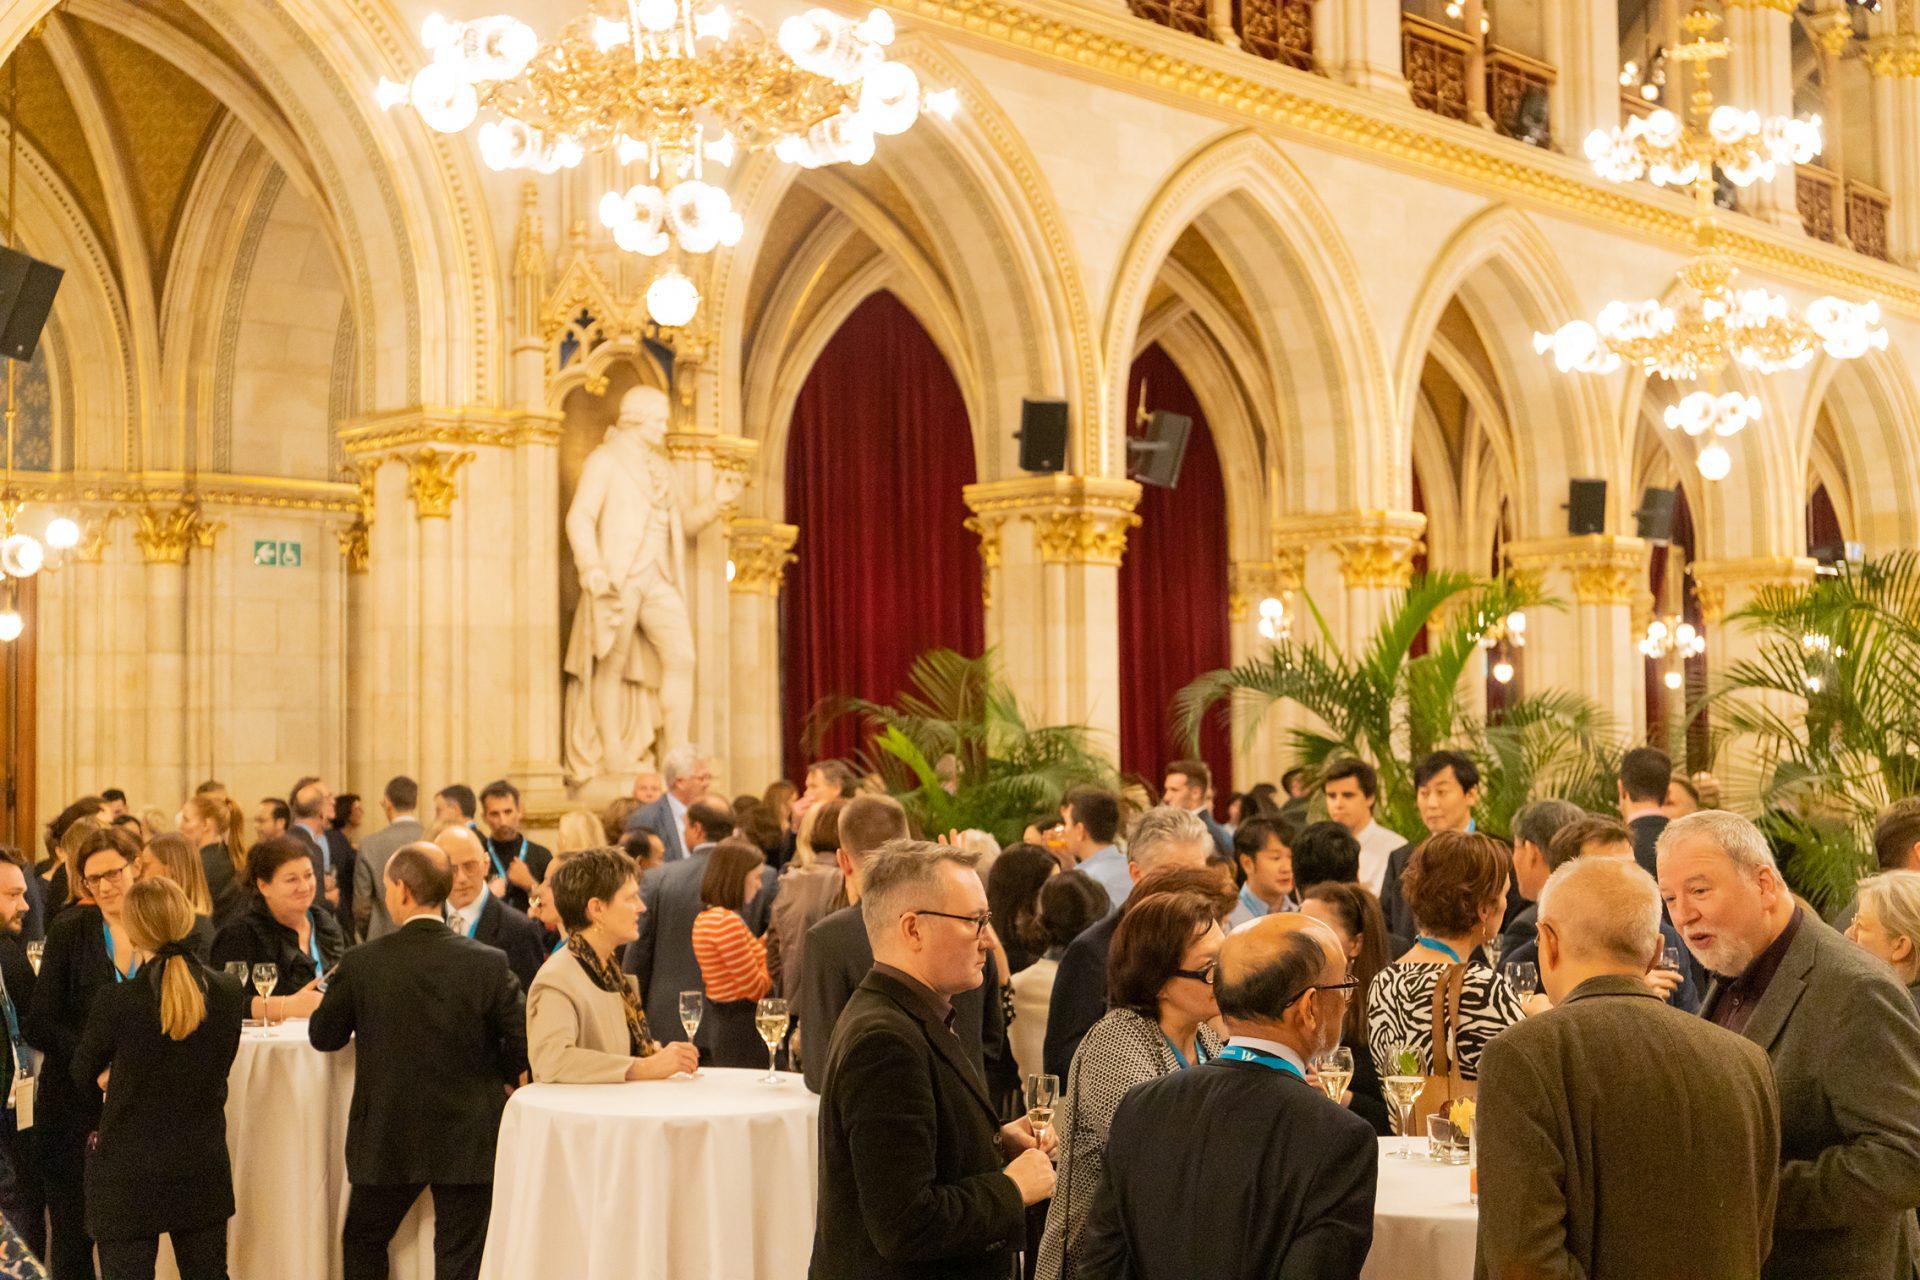 6H5A7717_20191129_CEMS_ANNUAL_EVENTS_2019_VIENNA